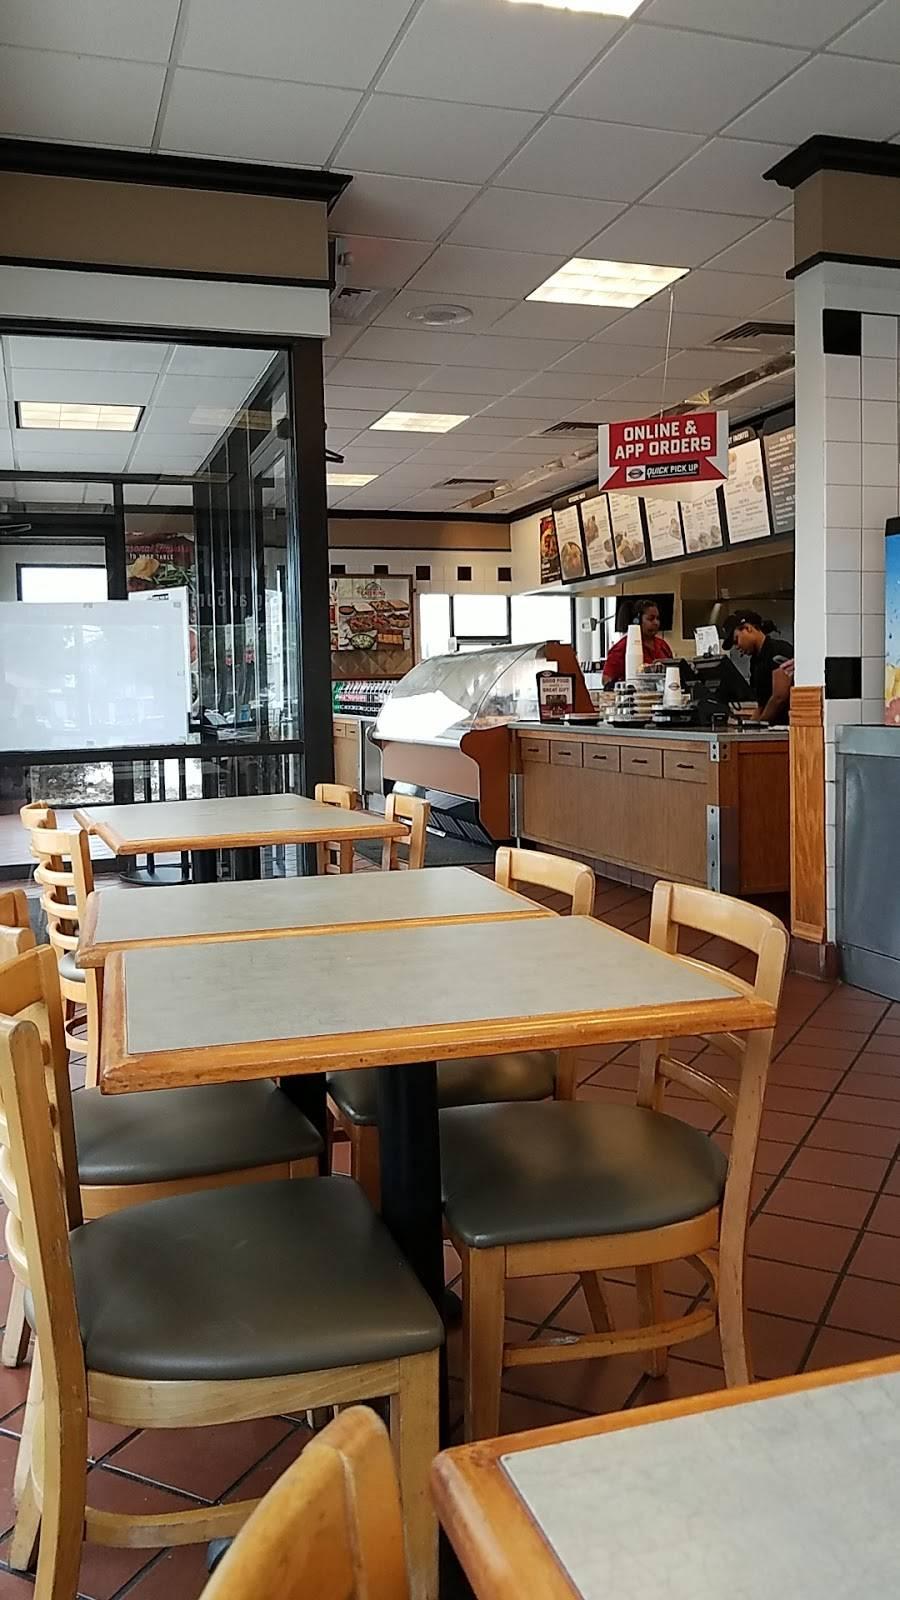 Boston Market | restaurant | 3981 Virginia Beach Blvd, Virginia Beach, VA 23452, USA | 7574987900 OR +1 757-498-7900